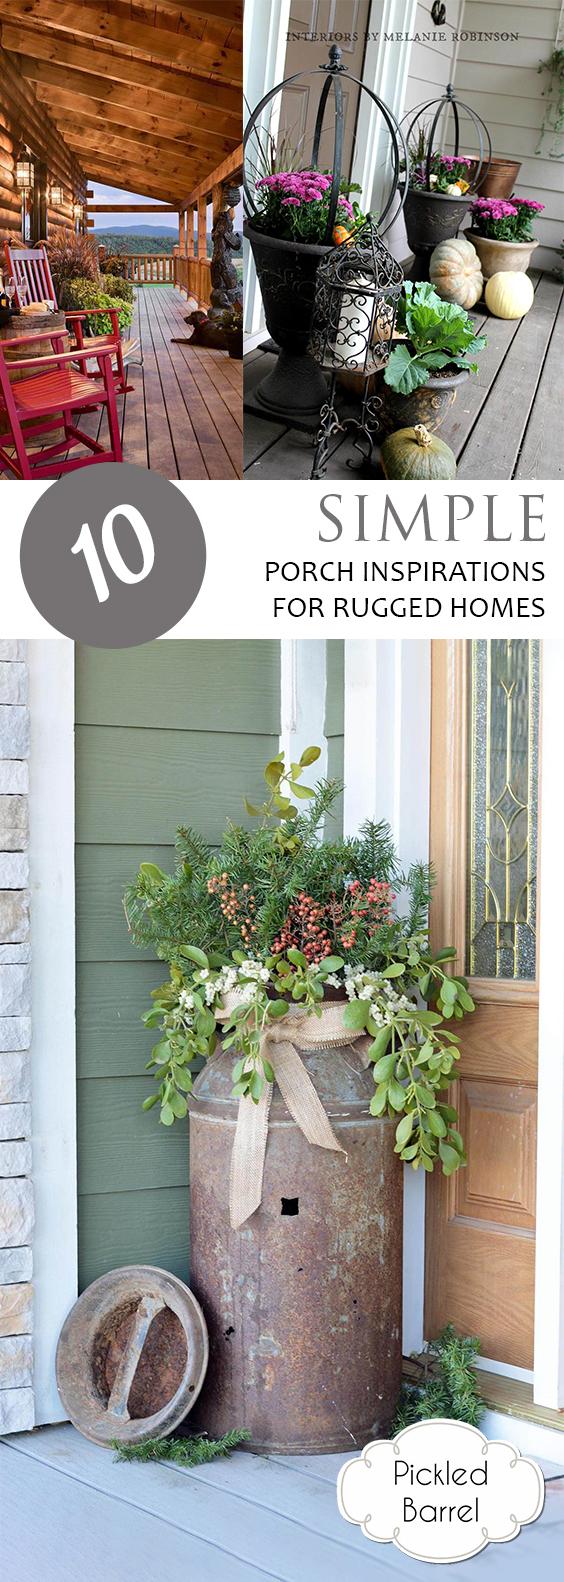 10 Simple Porch Inspirations for Rugged Homes| Porch Decor, Rustic Porch Ideas, Fast Porch Ideas, How to Decorate Your Porch Fast, Rugged Porch Inspirations, Porch and Patio Inspiration, Popular Pin. #porch #porchdecor #homedecor #curbappeal #diyporch #diyhomedecor #diyhome